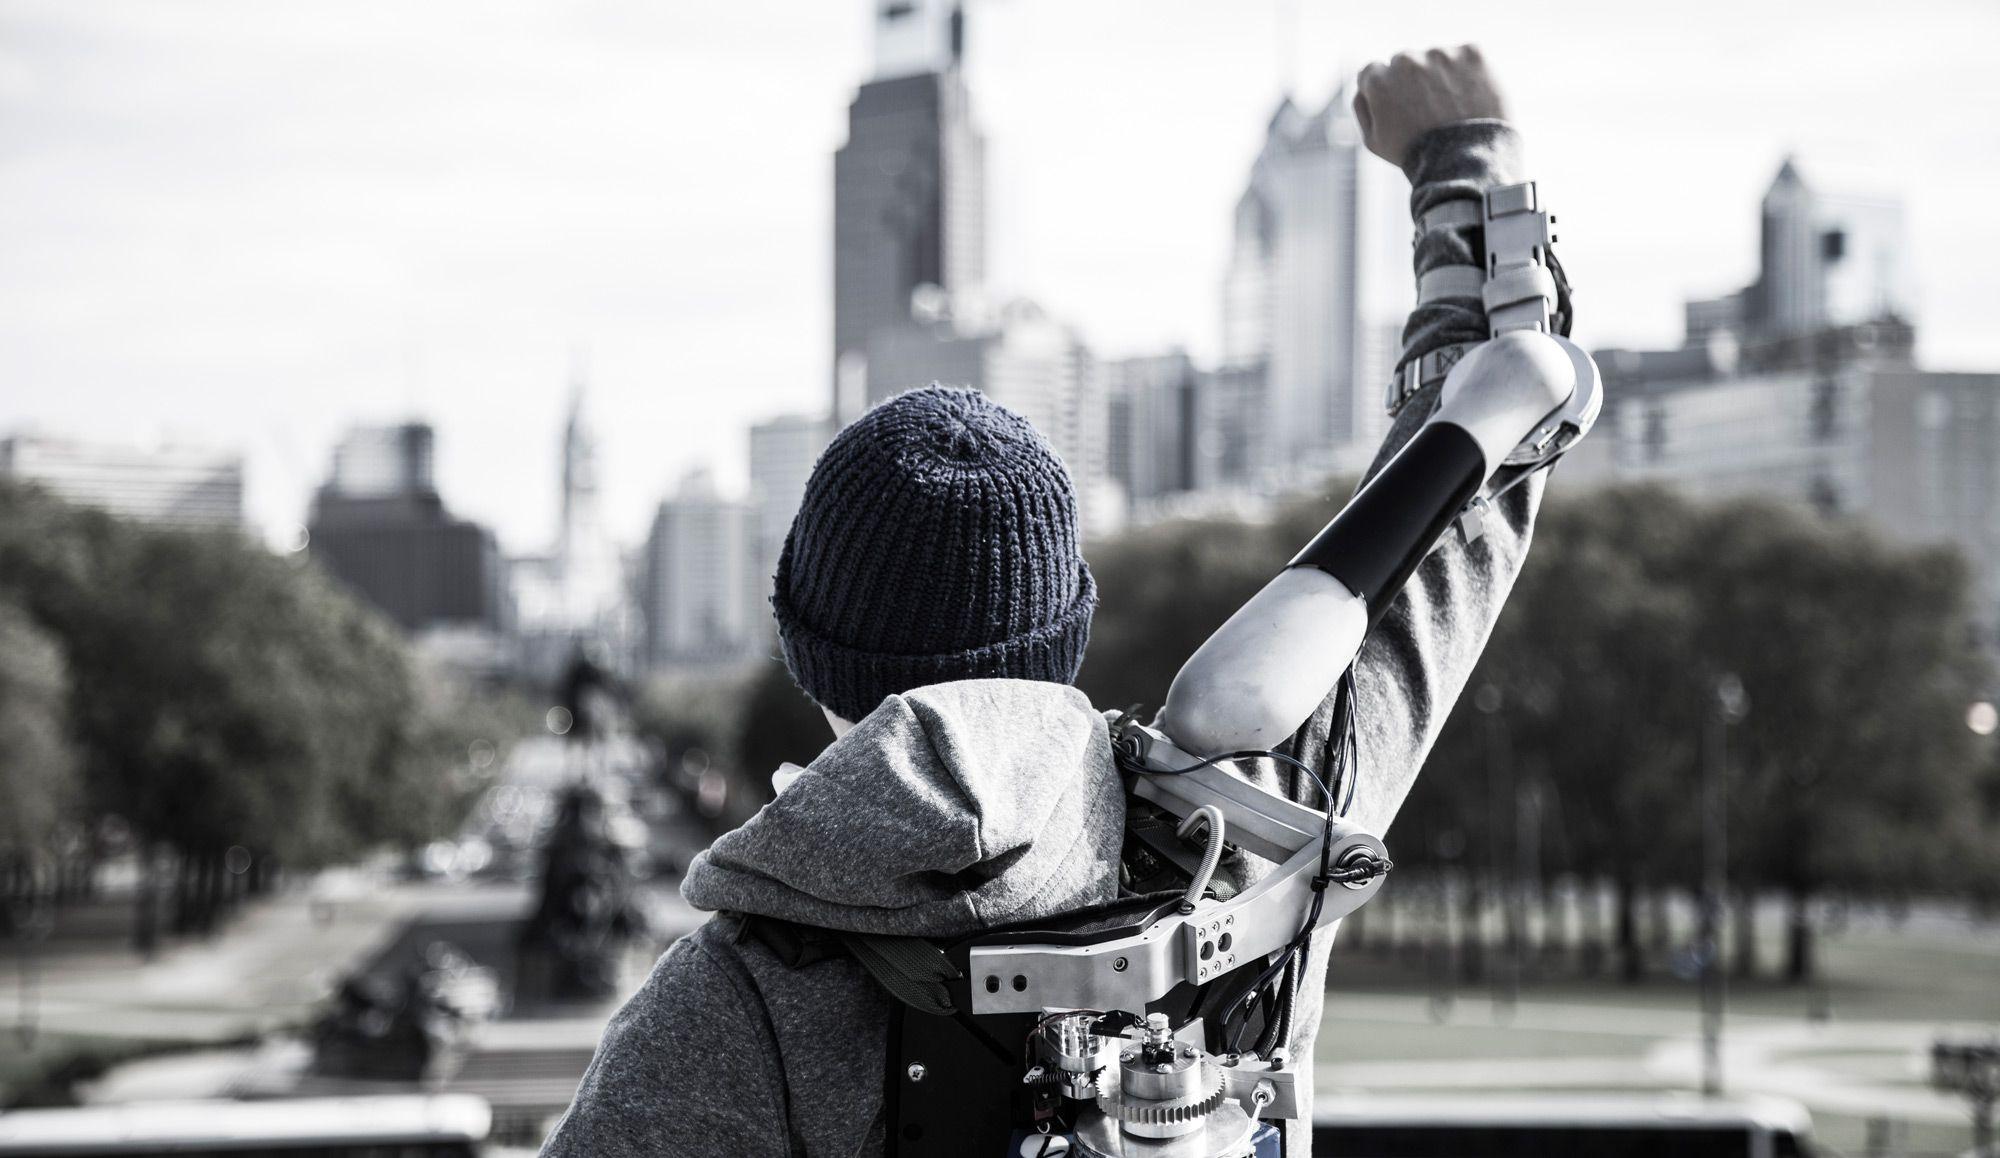 Robotic arm wins James Dyson Award